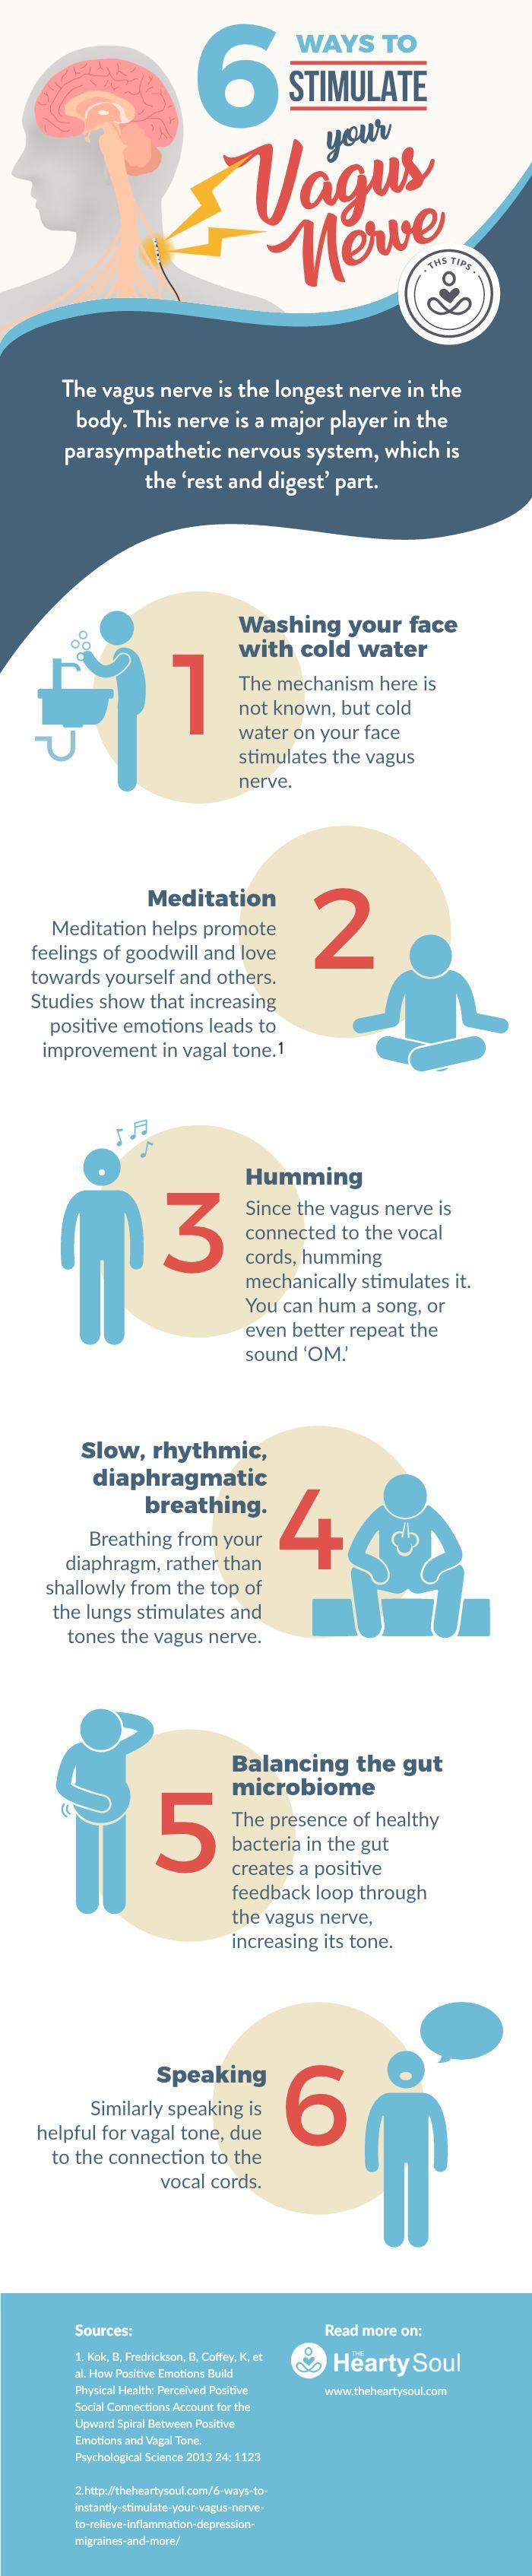 6 ways to stimulate the vagus nerve